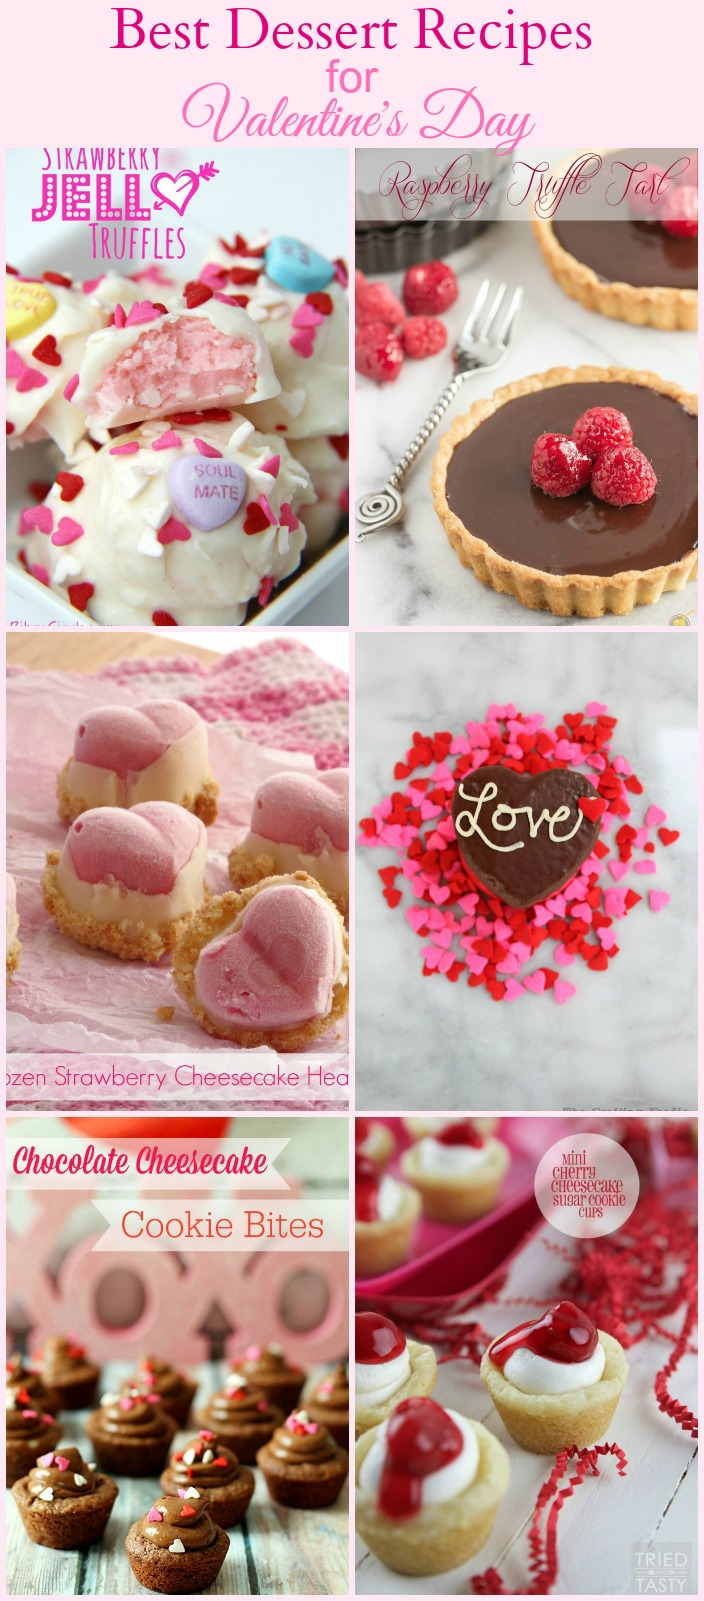 Best Dessert Recipes for Valentine's Day